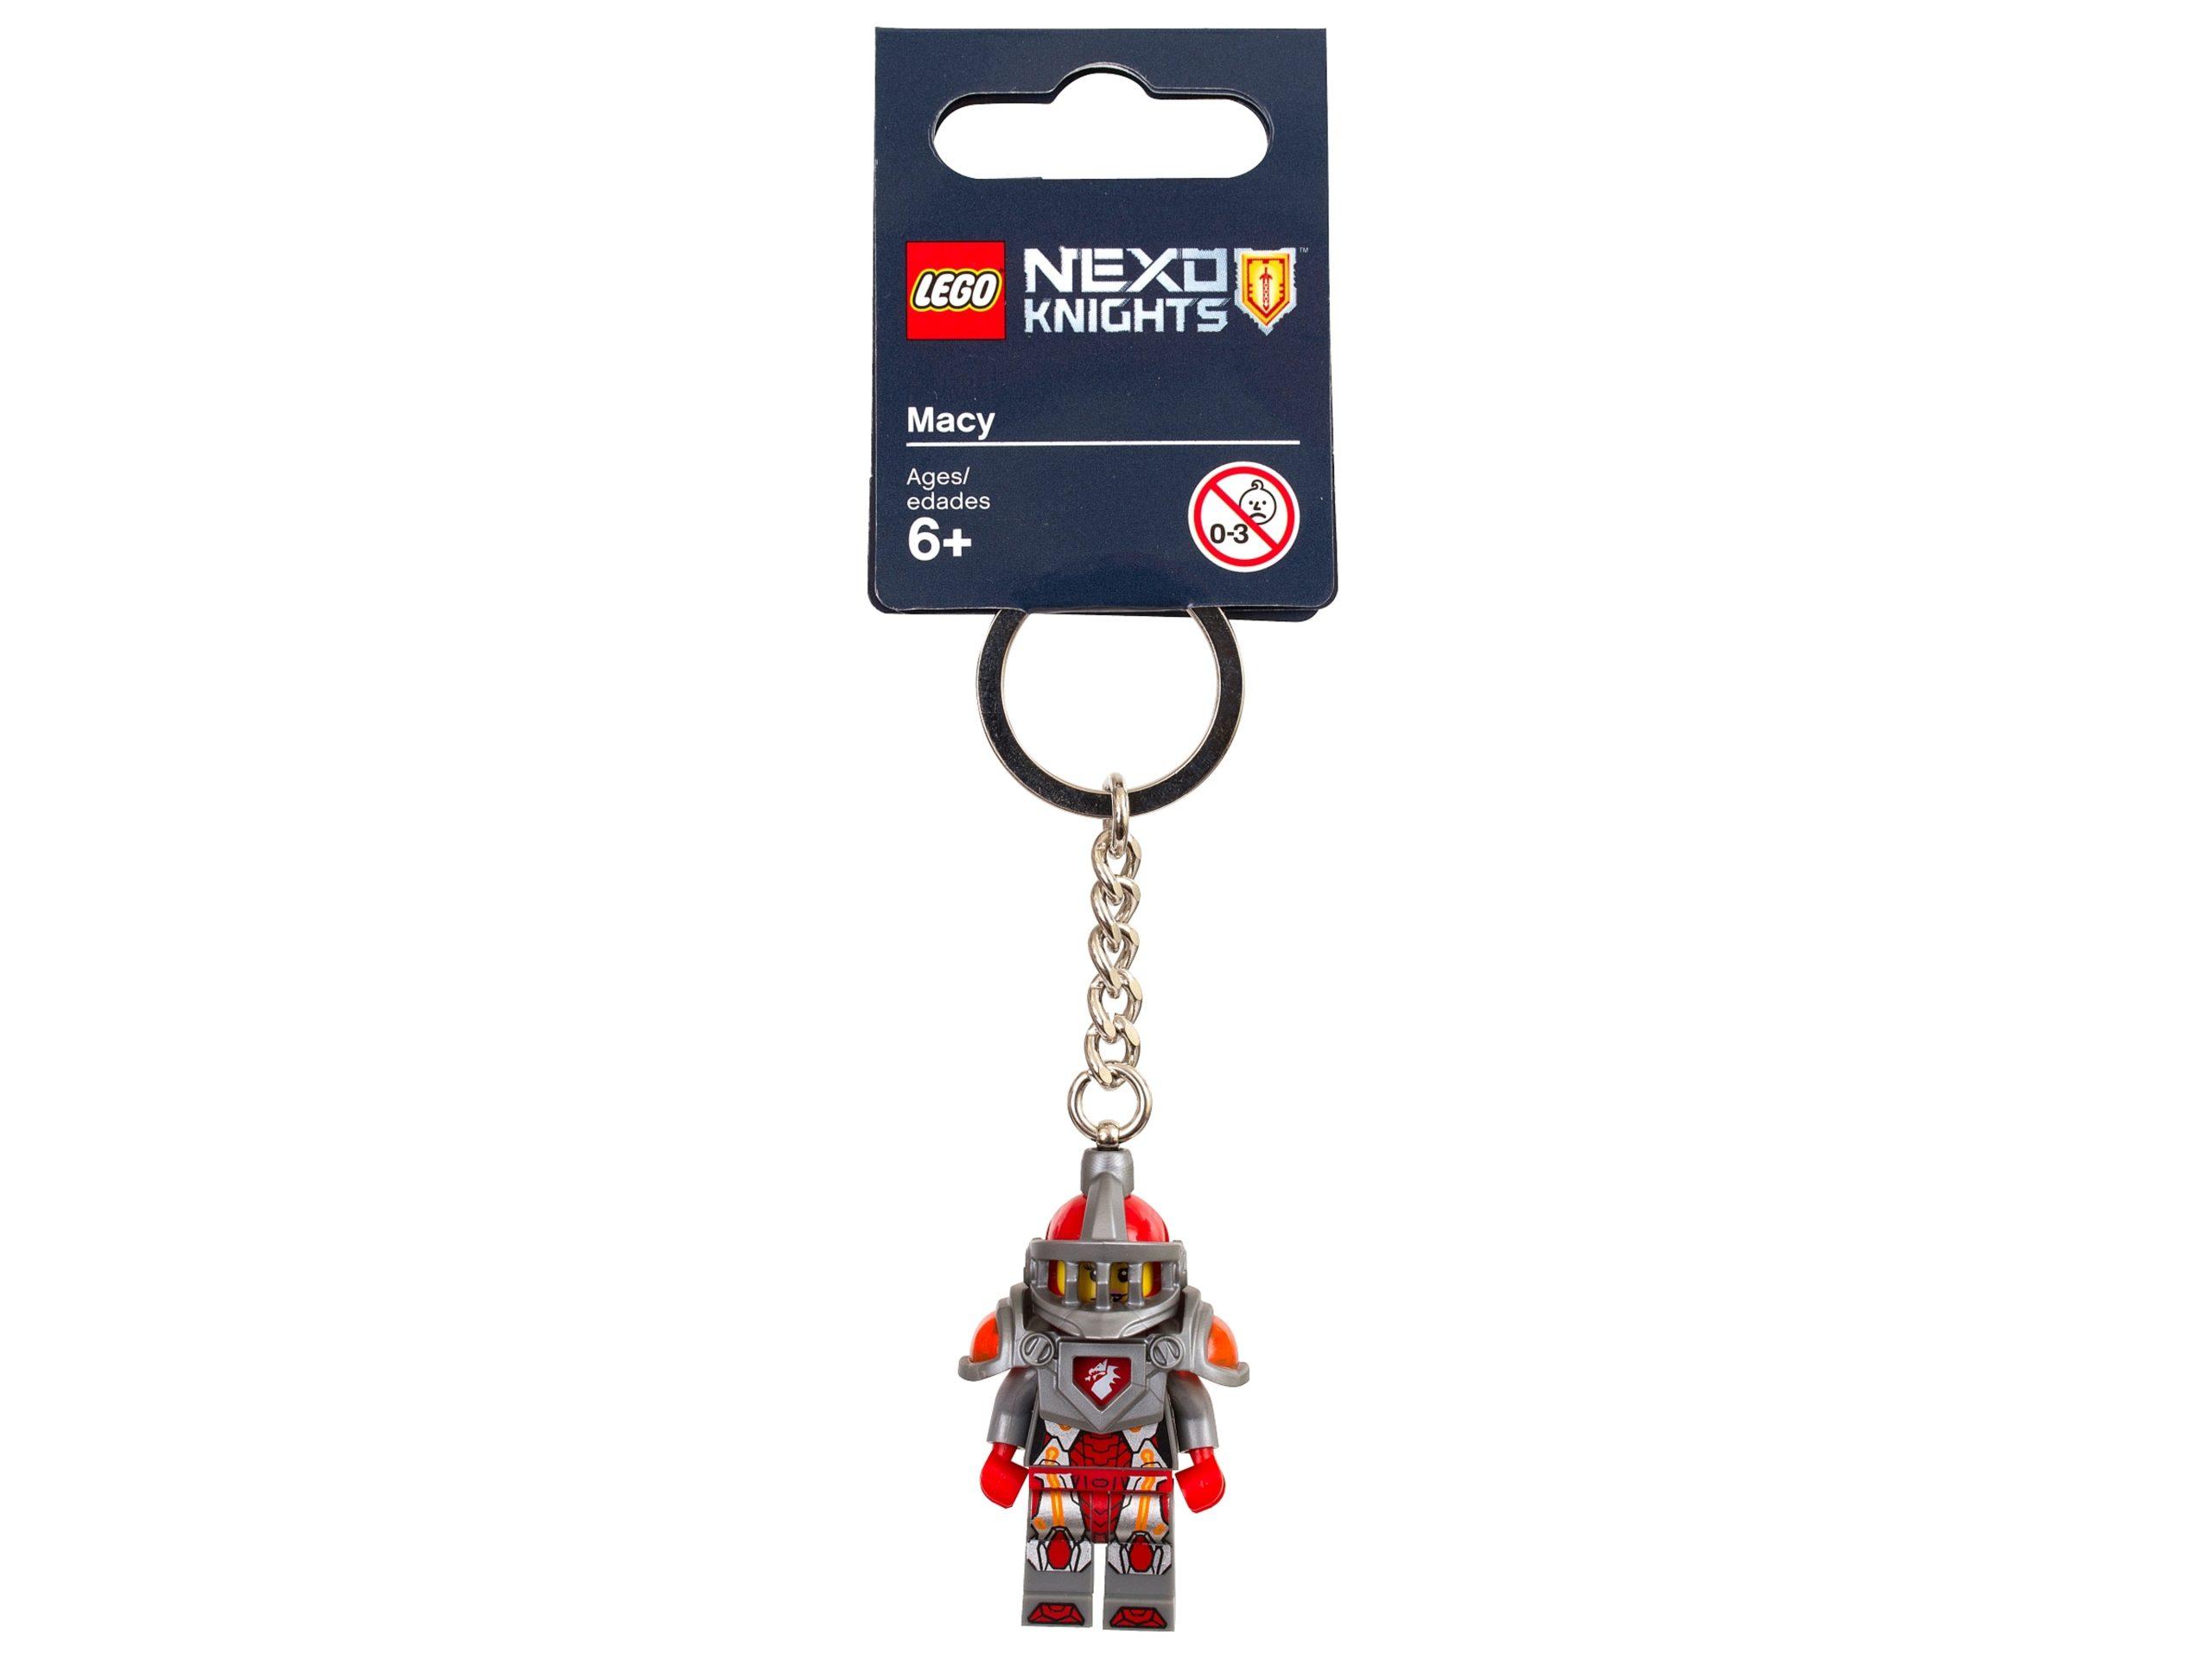 lego 853522 nexo knights macy key chain scaled